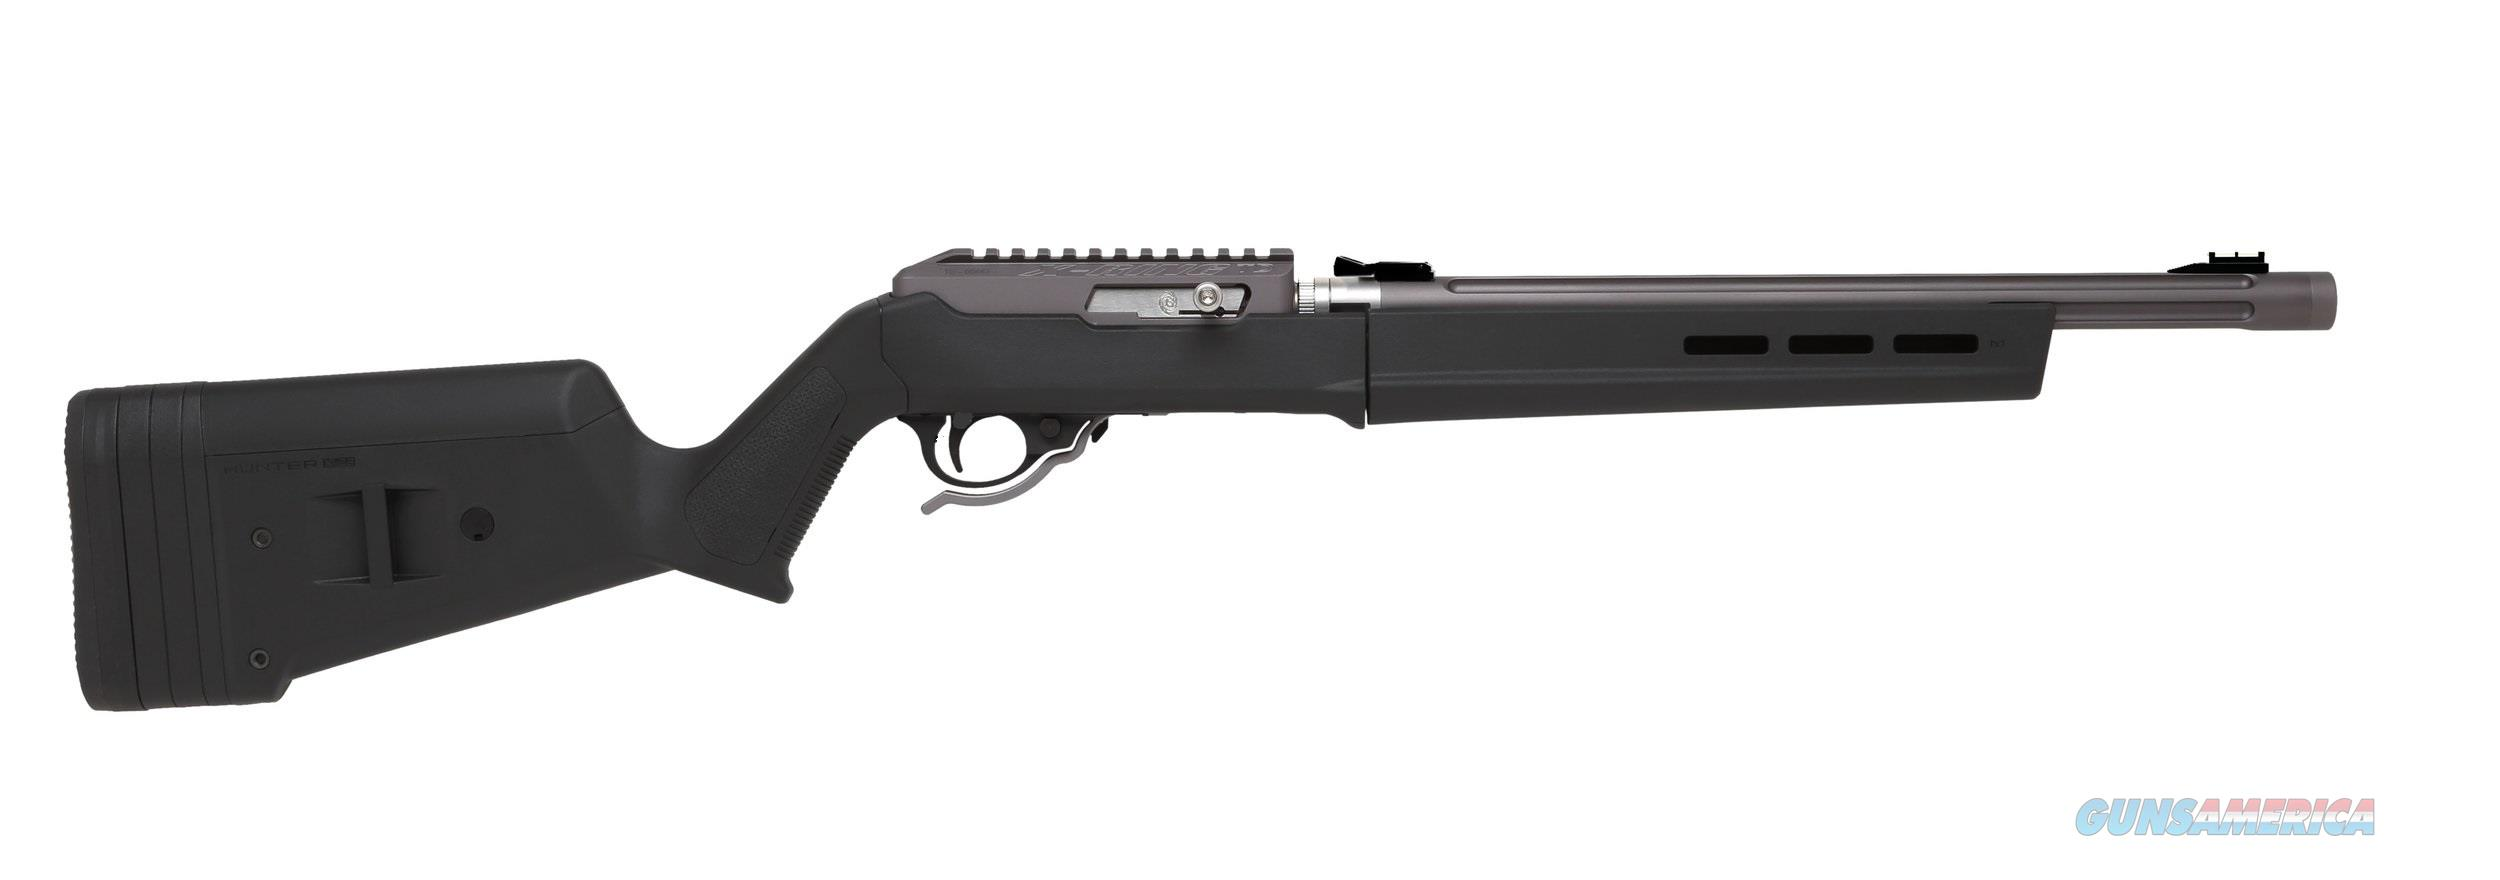 Tactical Solutions X-Ring Takedown Magpul .22 LR Gun Metal/Black TD-GMG-B-M-BLK   Guns > Rifles > Ruger Rifles > 10-22